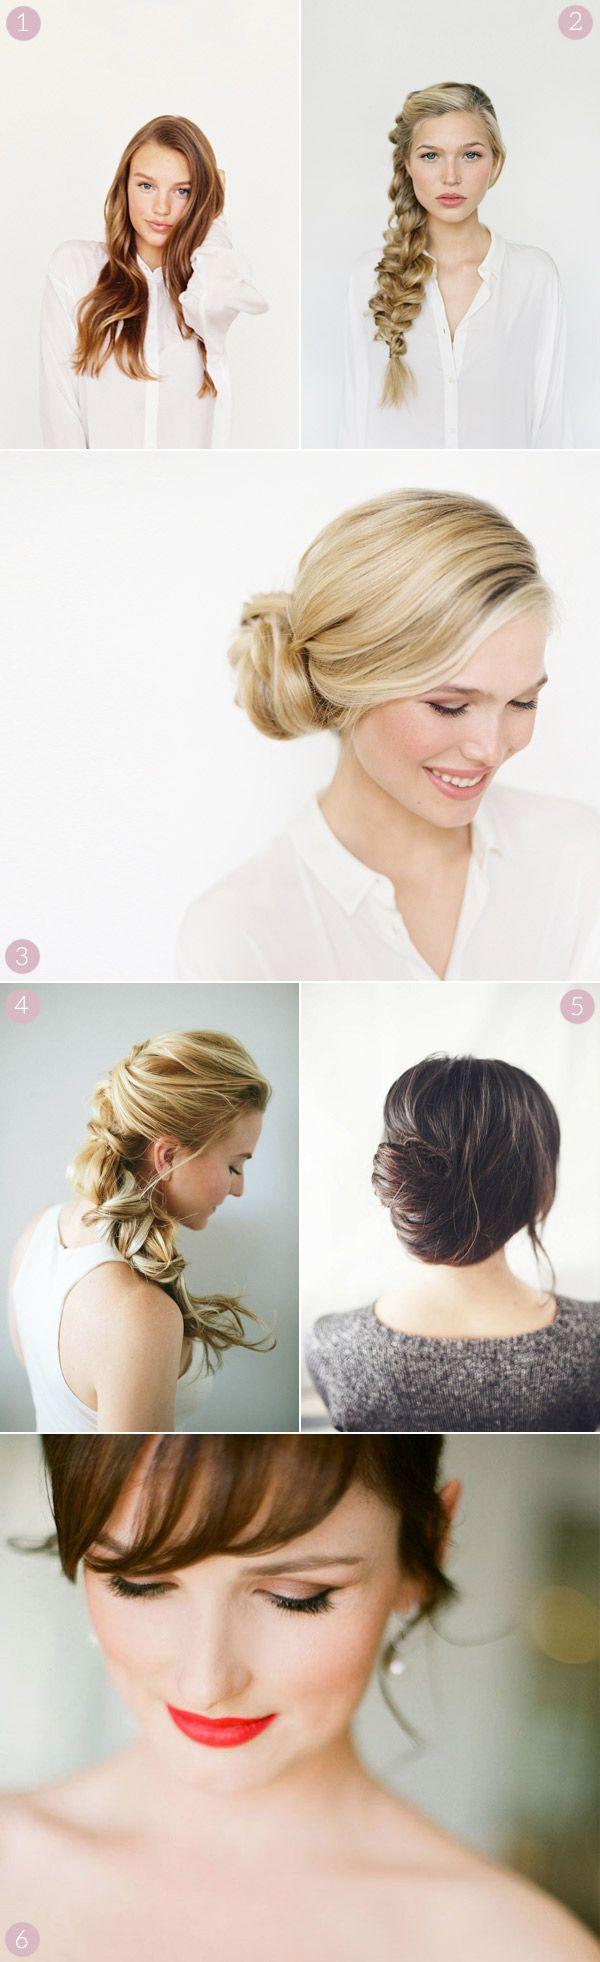 715 best Everything Wedding images on Pinterest | Wedding ideas ...